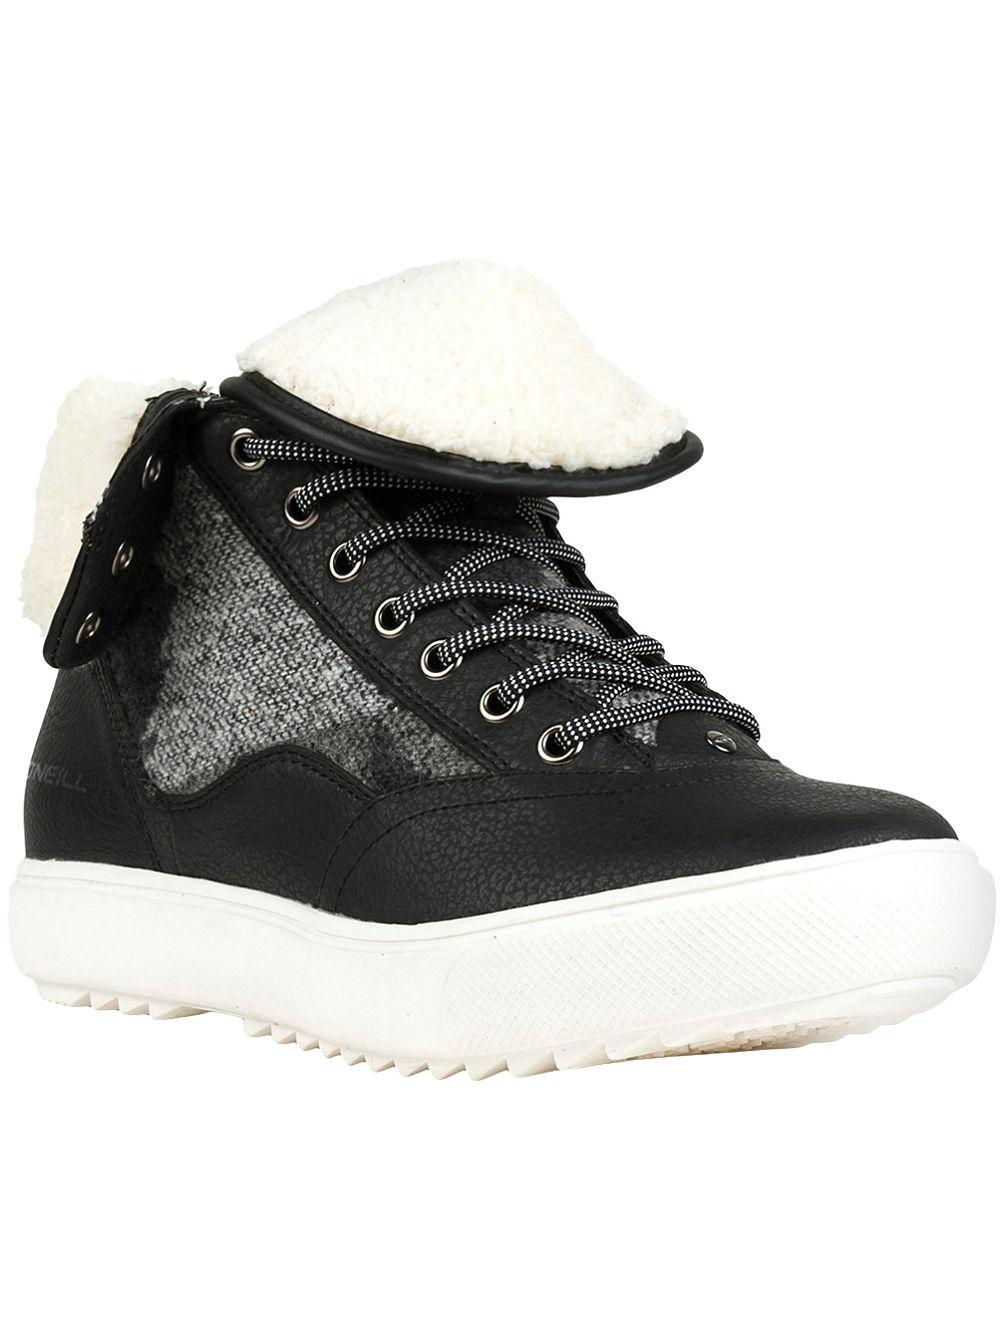 o-neill-fosho-boots-women